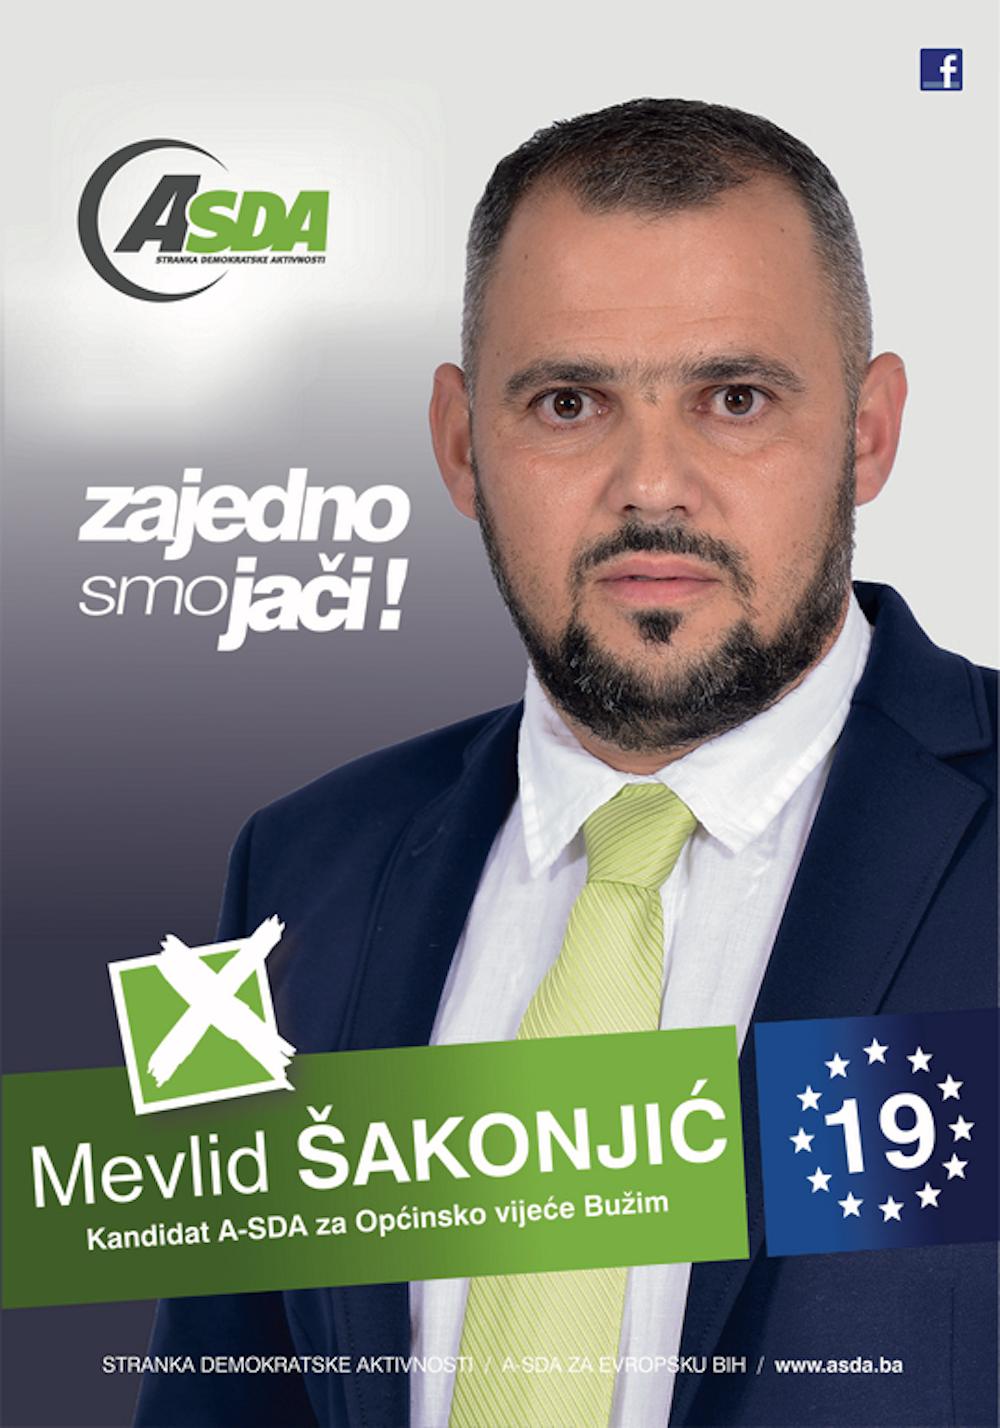 Mevlid Šakonjić